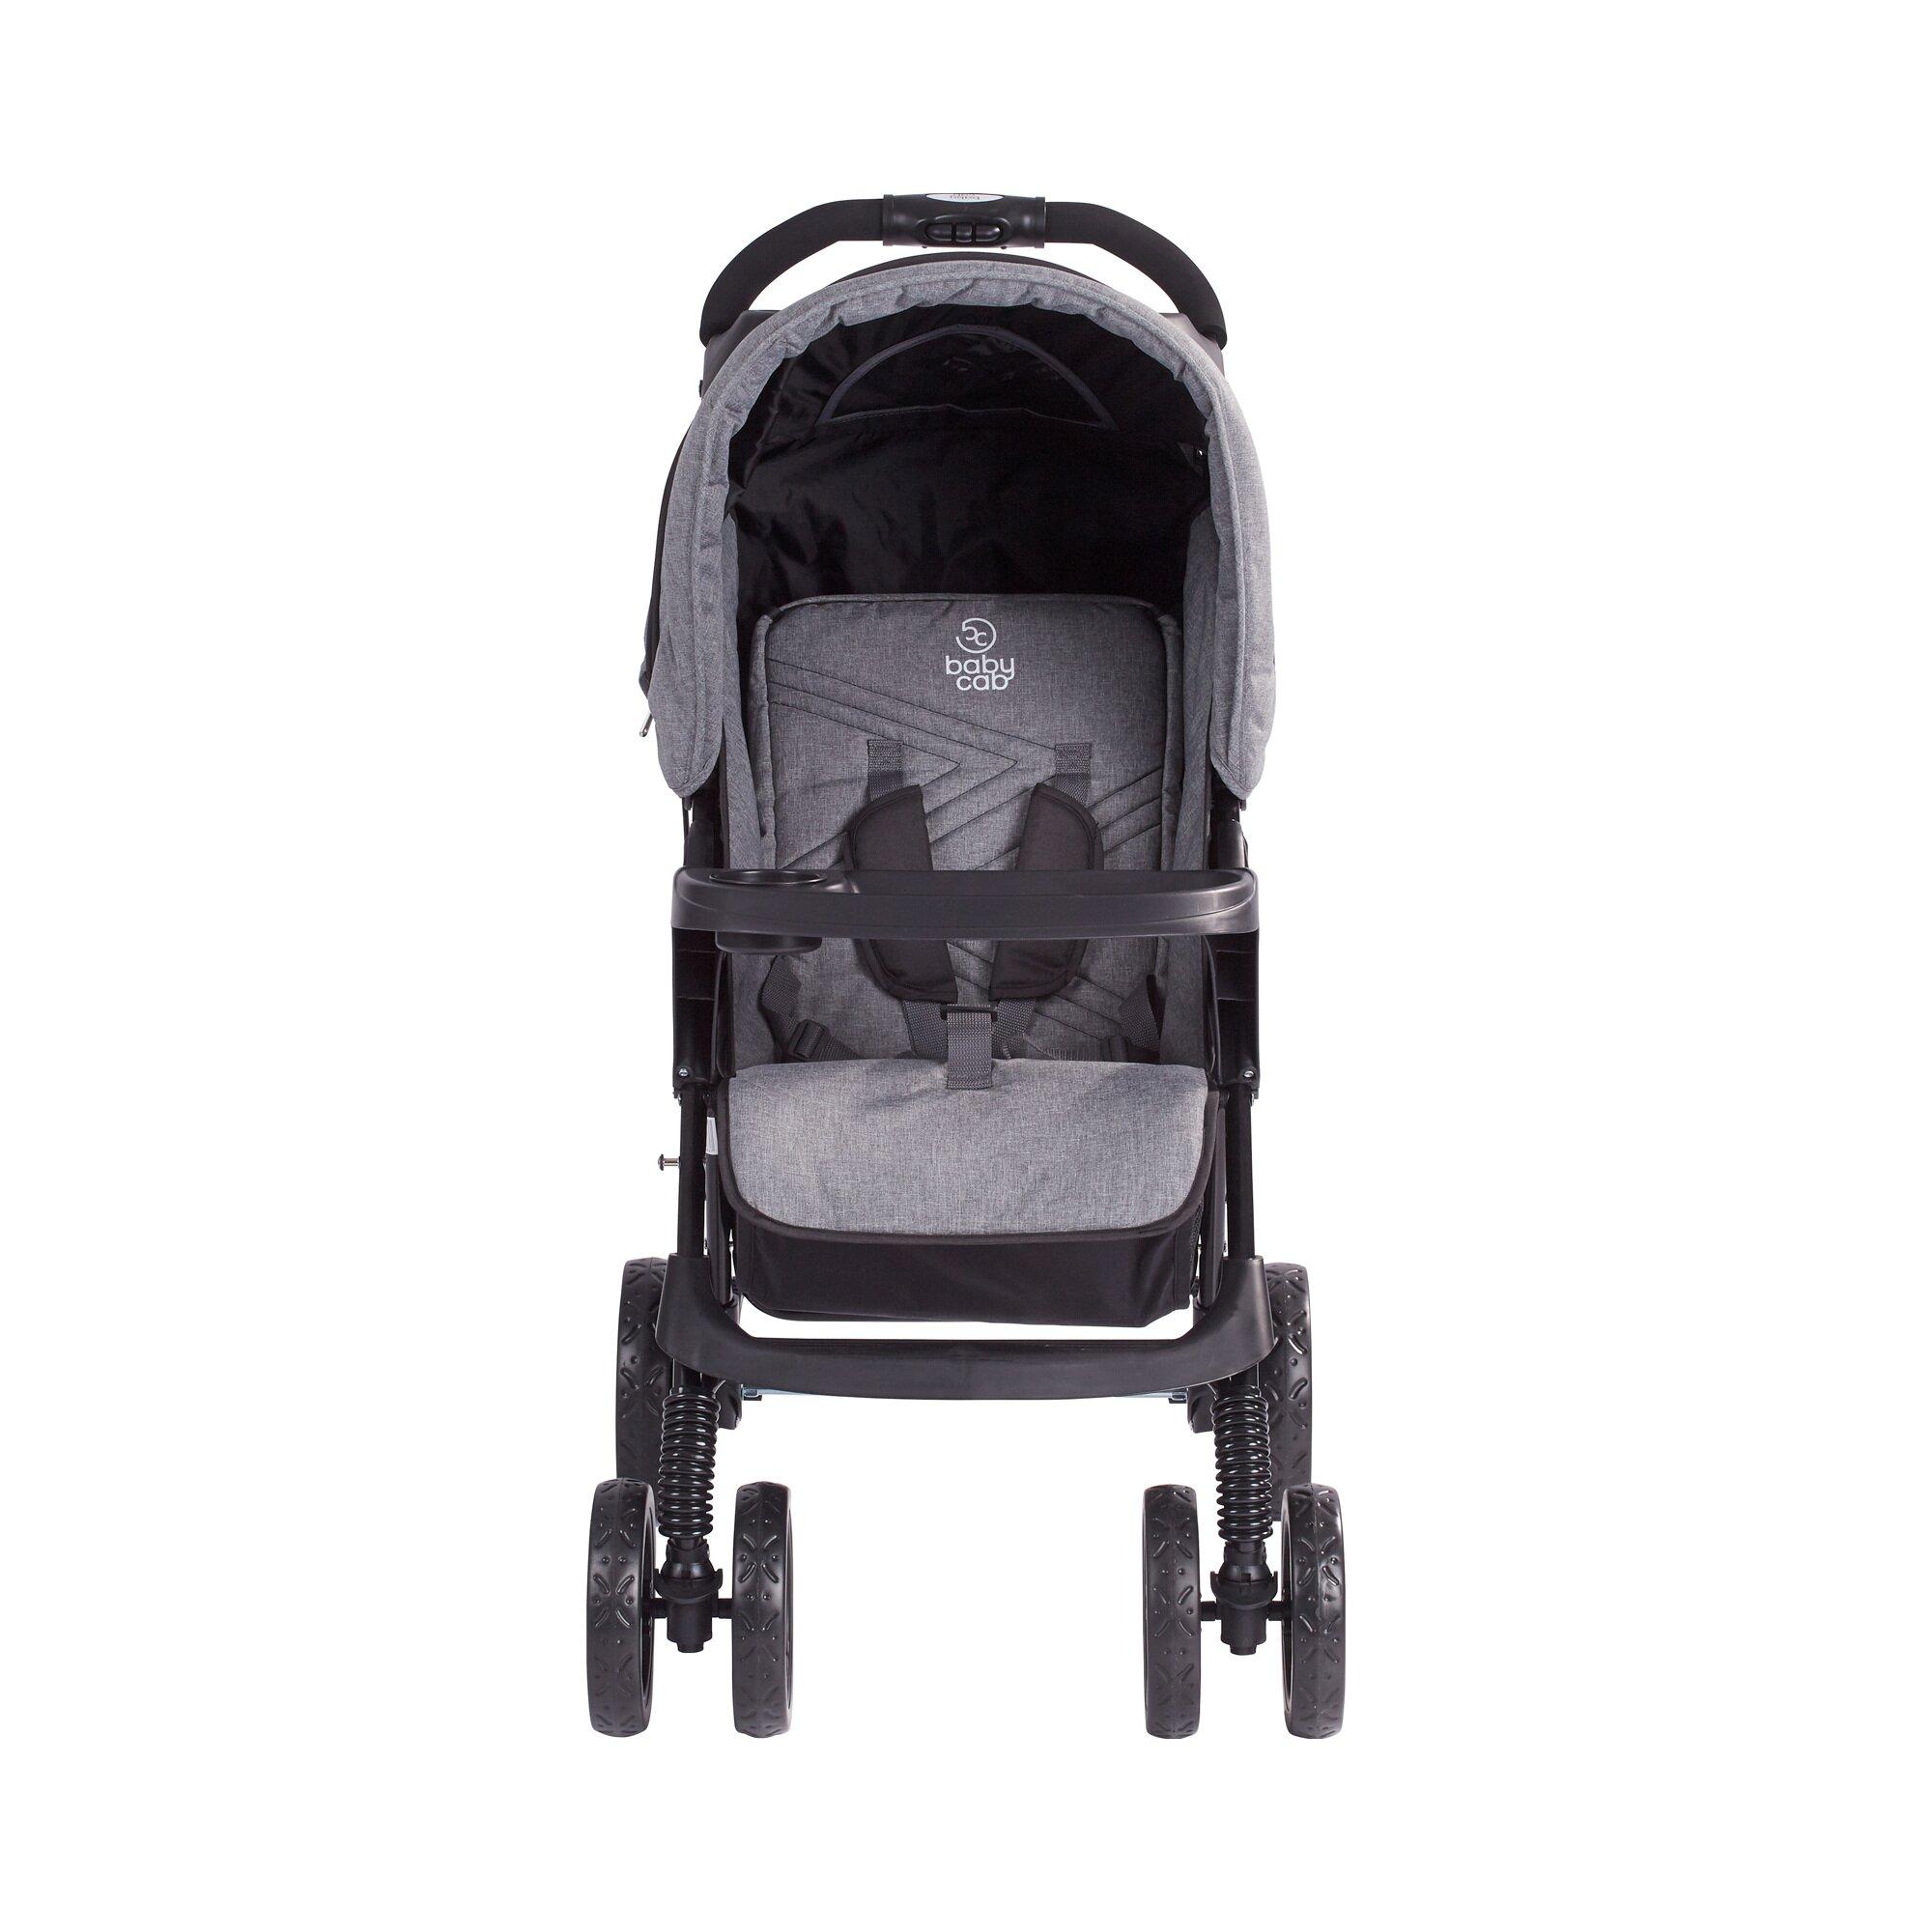 babycab-joe-kinderwagen-sportwagen-grau